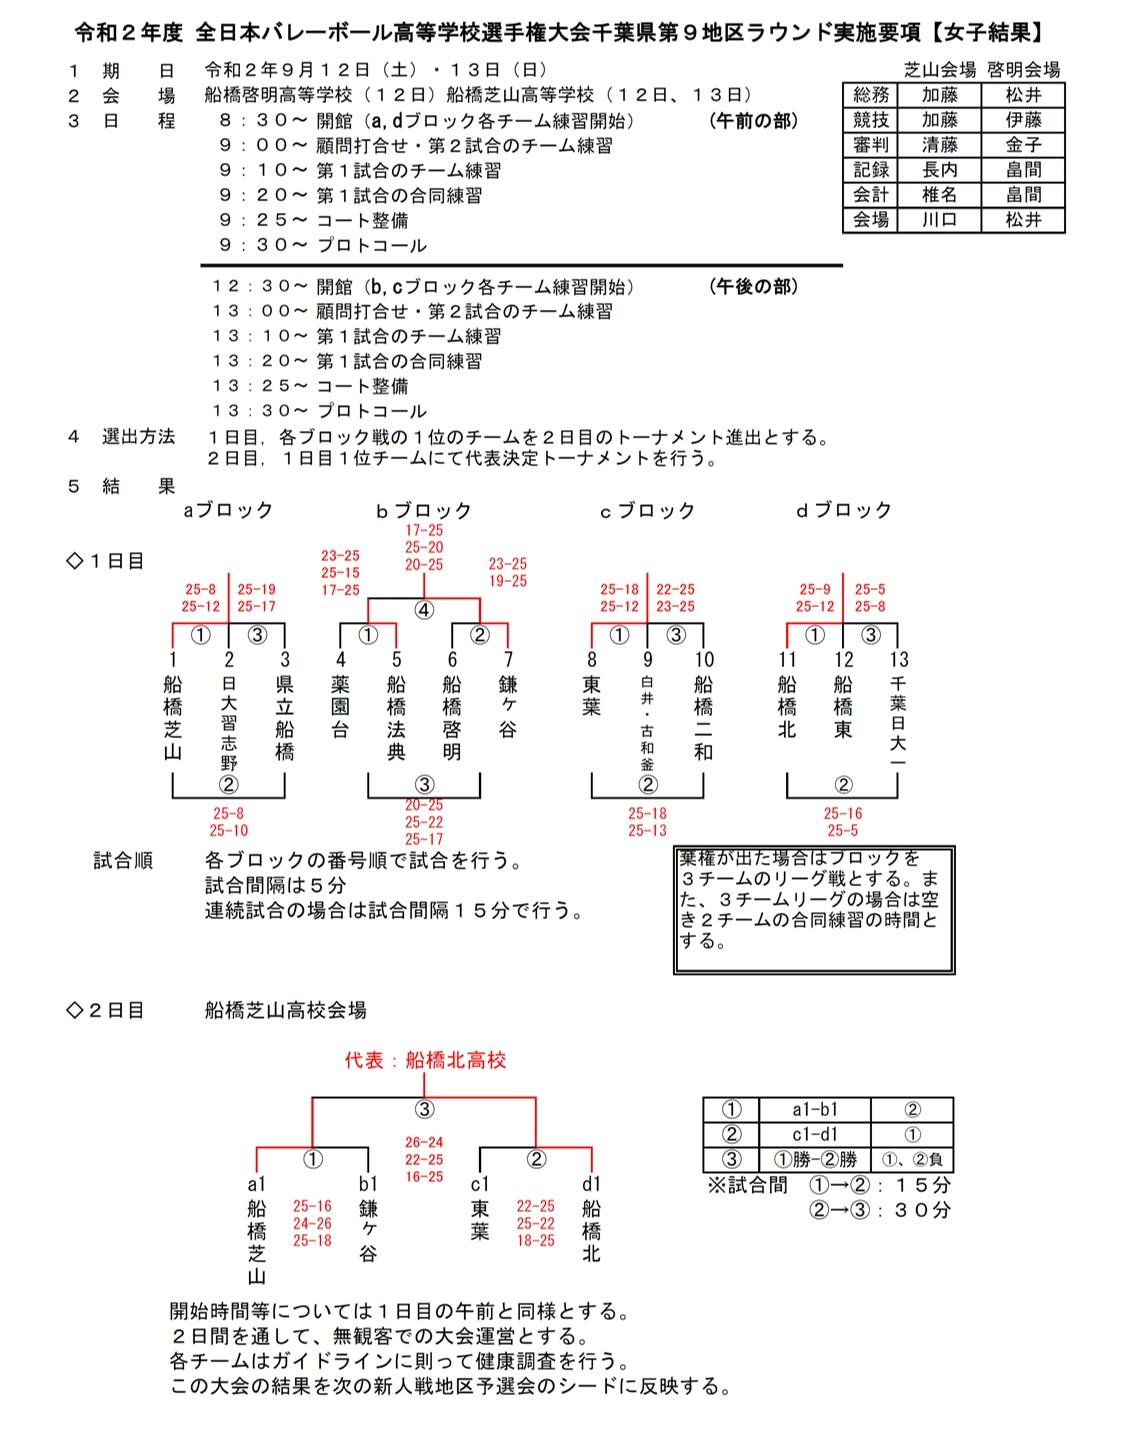 2021春高_千葉予選_1次ラウンド_第9地区_女子_結果